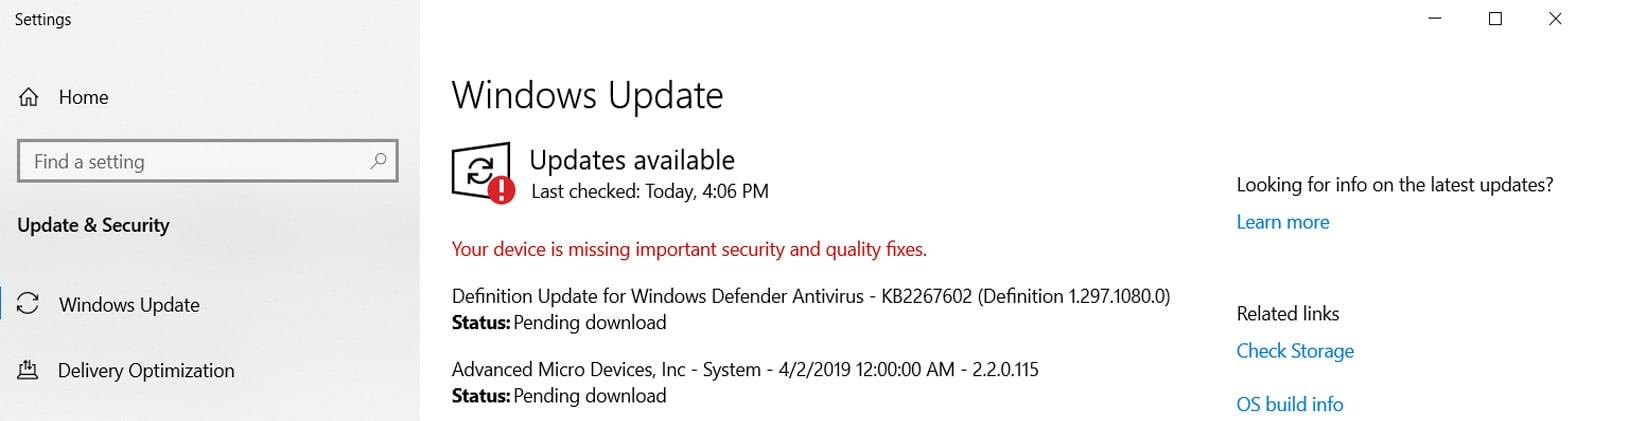 Xbox Game Pass Error Code Solutions - Xbox App